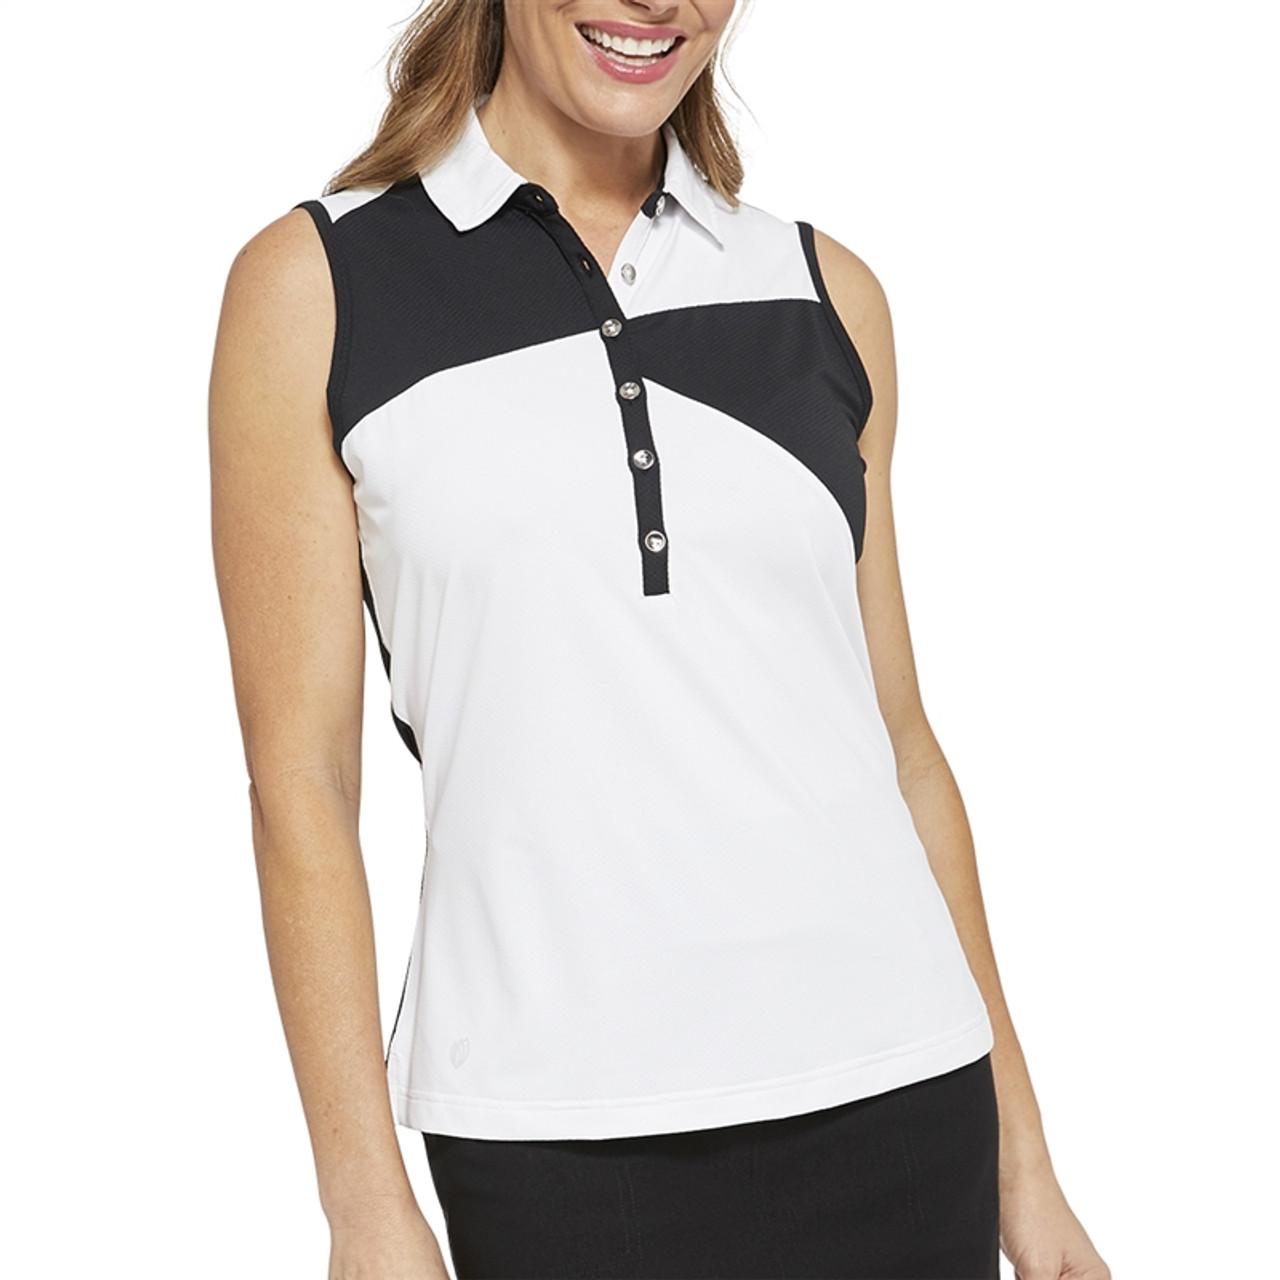 1f7b4fb7 GG Blue Jewel Sleeveless Golf Polo - White/Black | Golf4Her